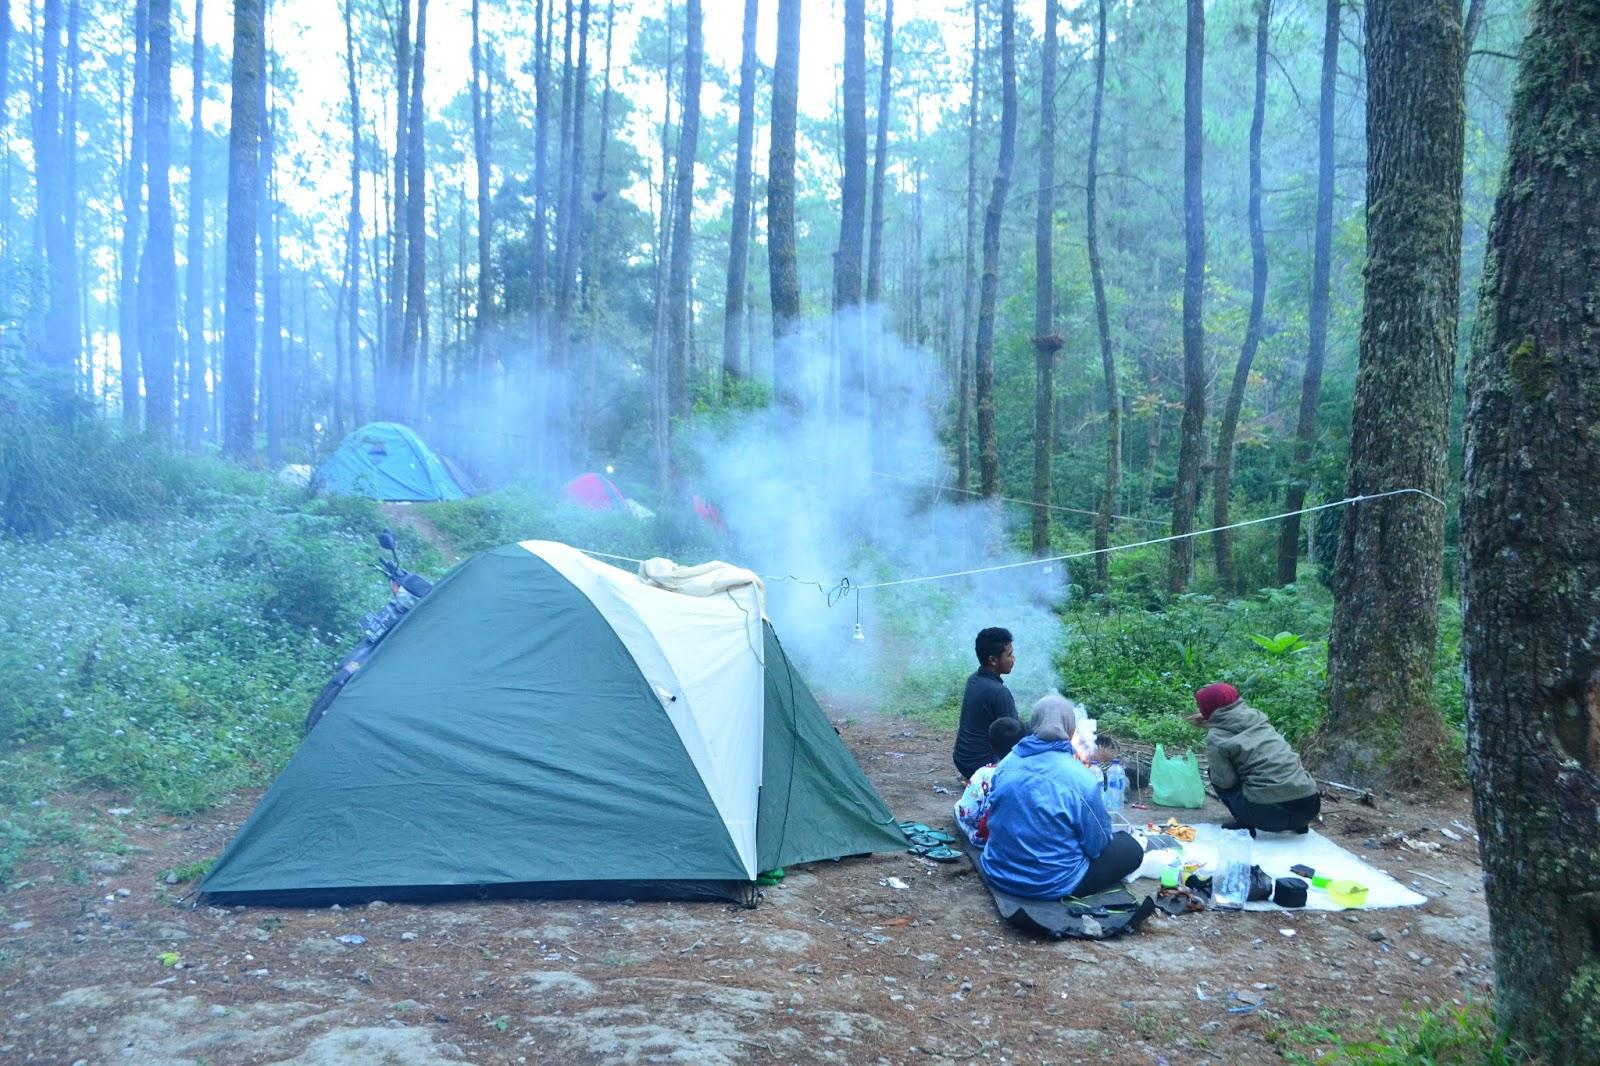 Pusat Informasi Serunya Camping Sekipan Tawangmangu Aktifitas Bisa Kita Lakukan